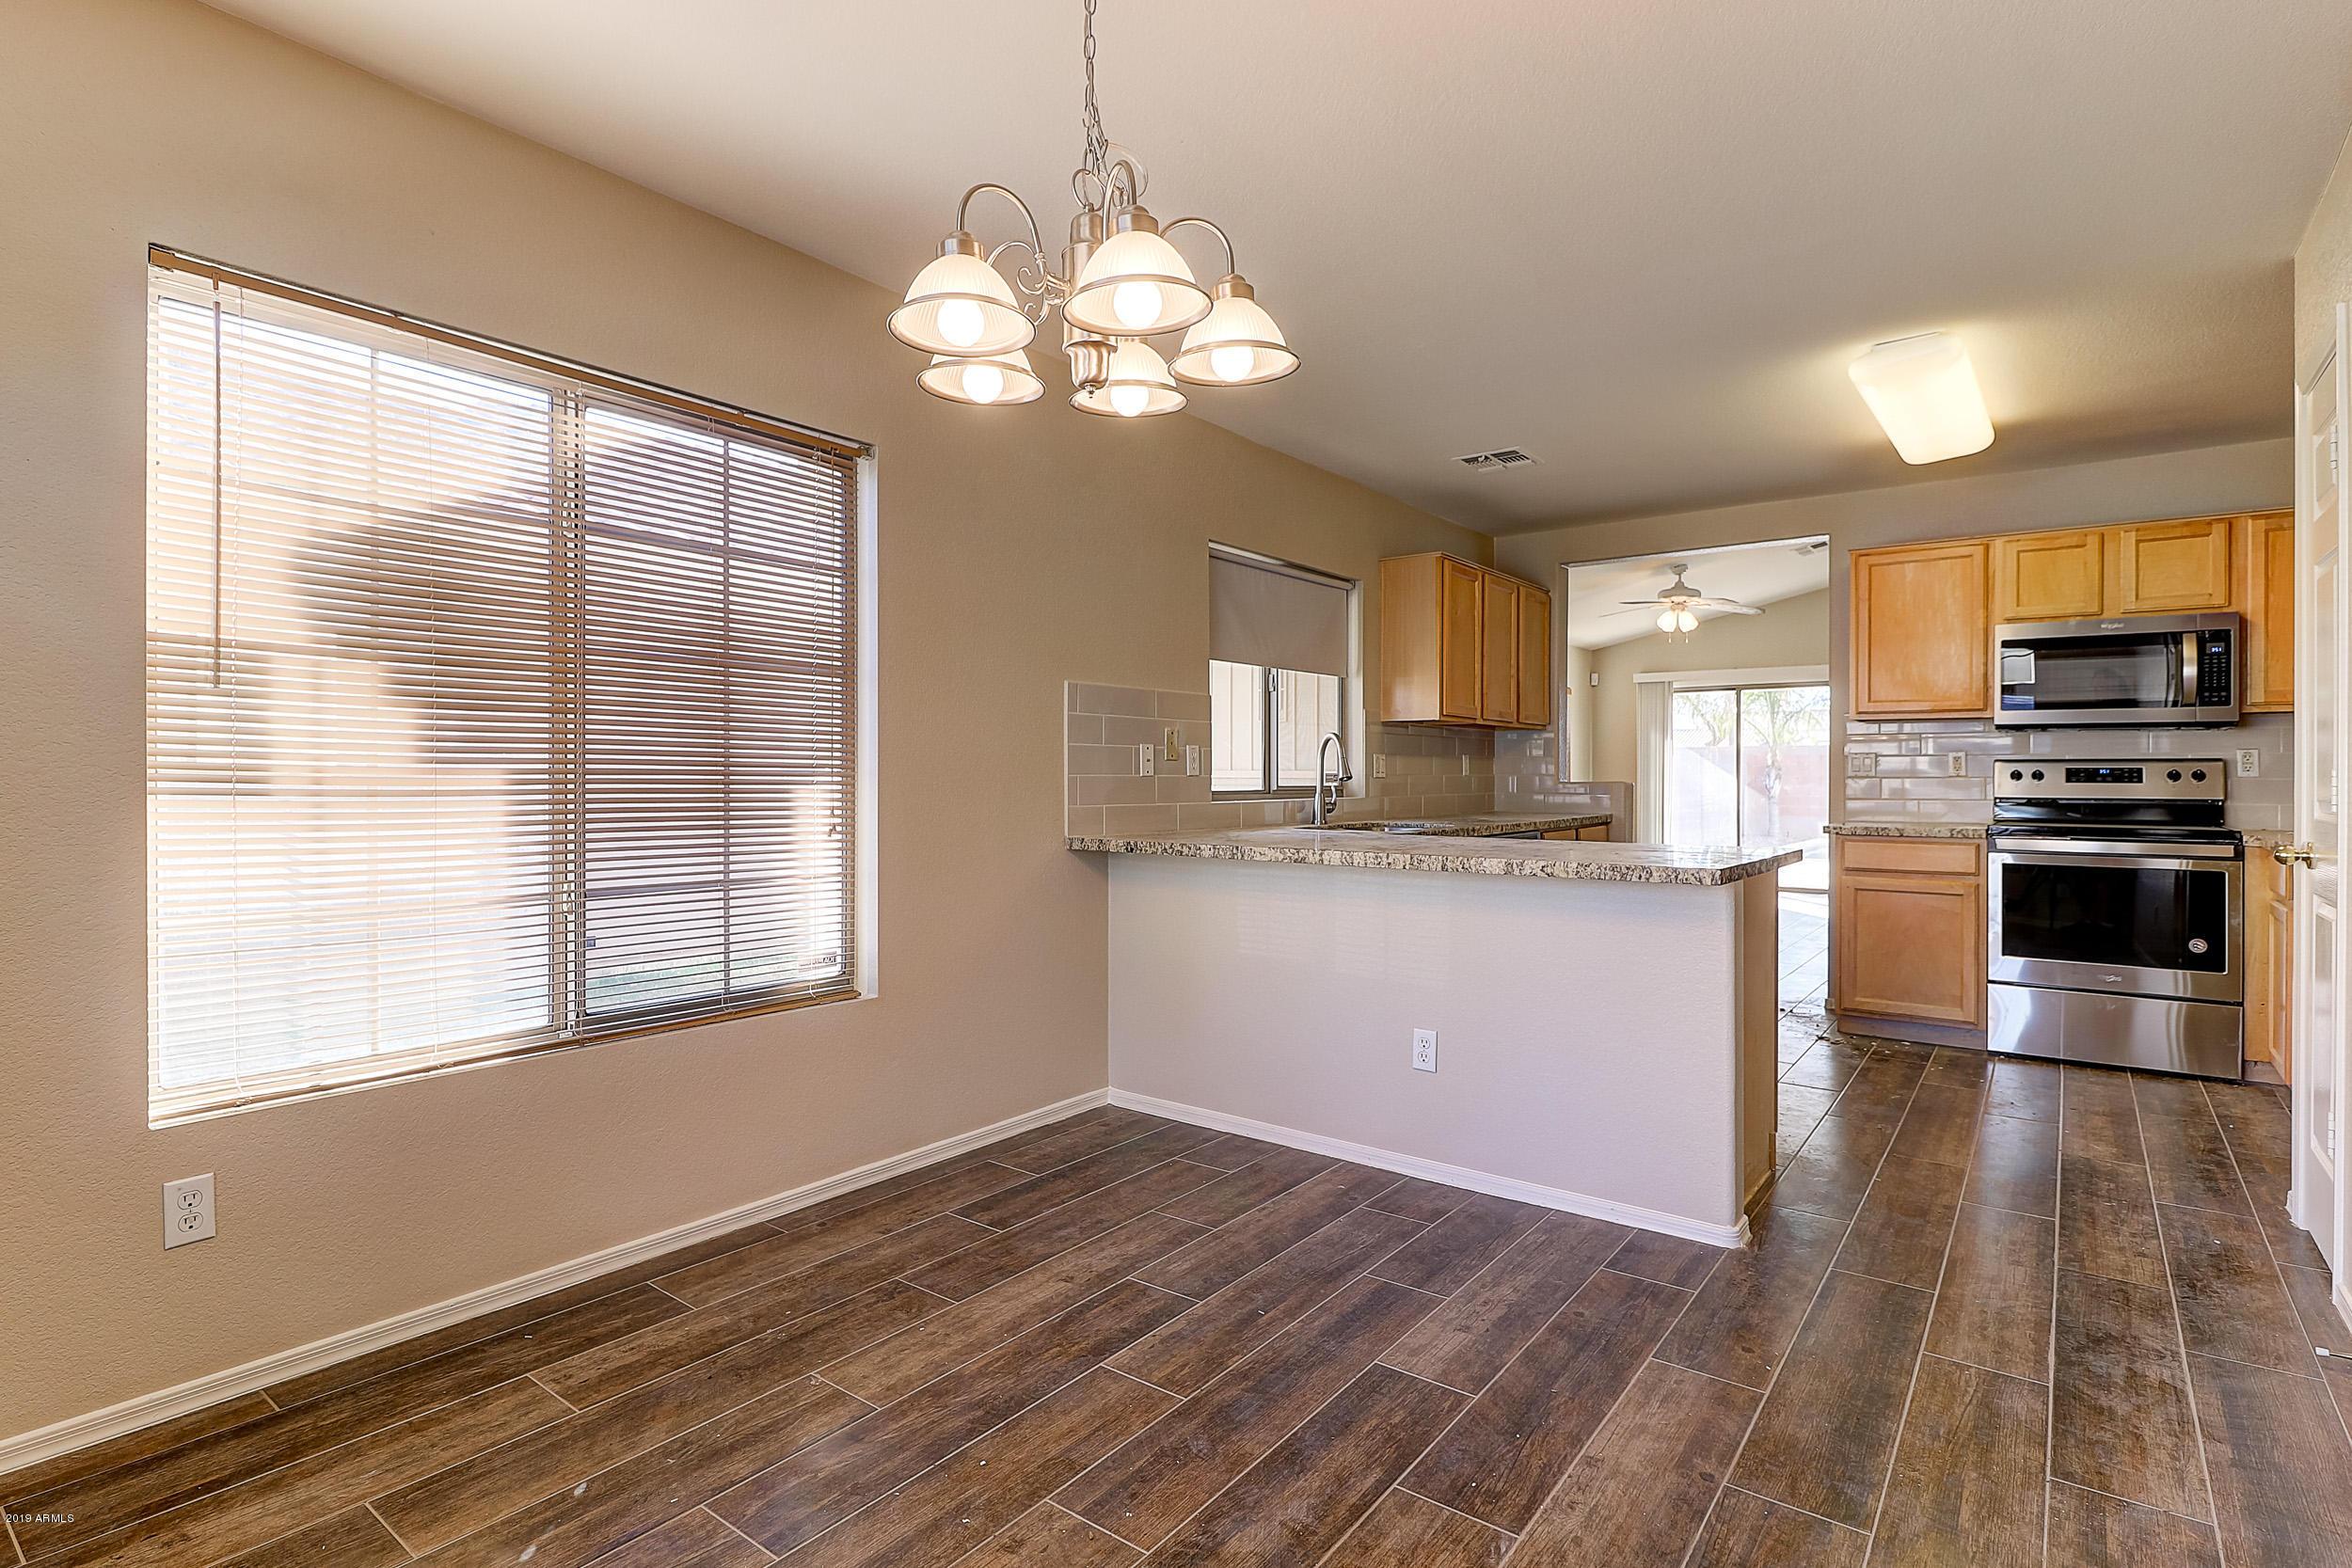 MLS 5879545 14106 N 130TH Lane, El Mirage, AZ 85335 El Mirage AZ Three Bedroom